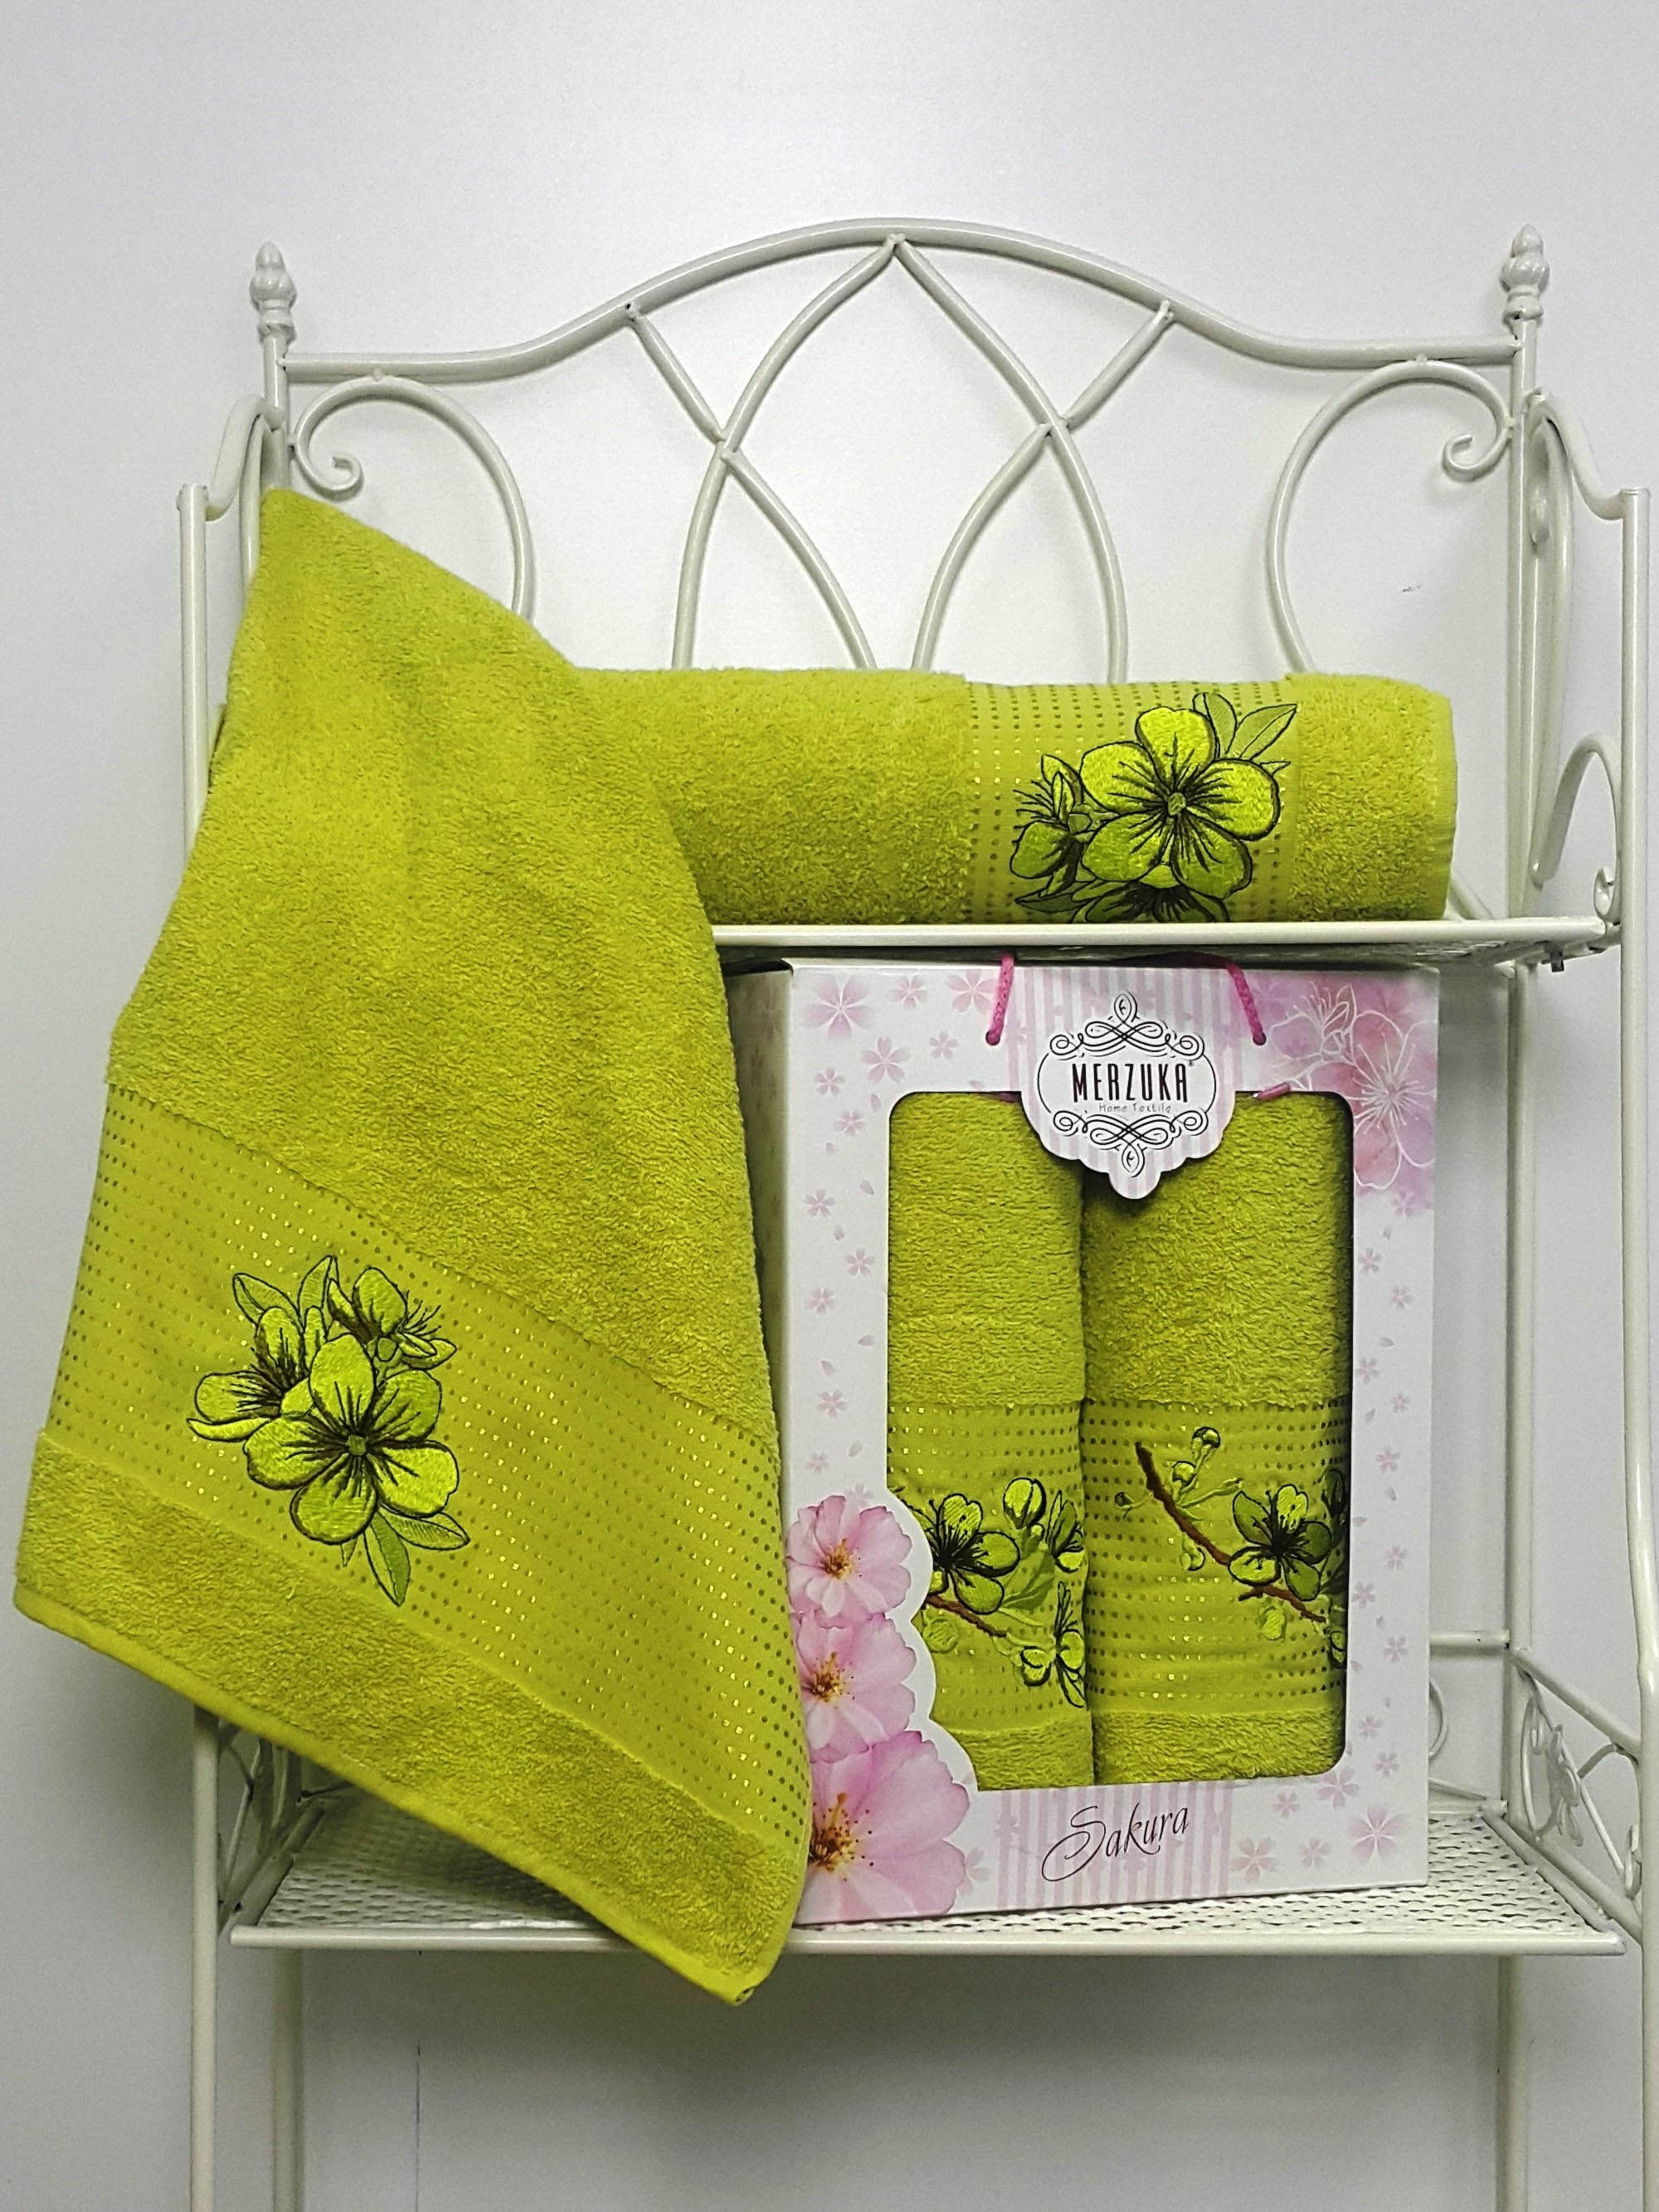 Полотенца Oran Merzuka Полотенце Sakura Цвет: Зелёный (Набор) набор из 3 полотенец merzuka sakura 50х90 2 70х140 8432 розовый